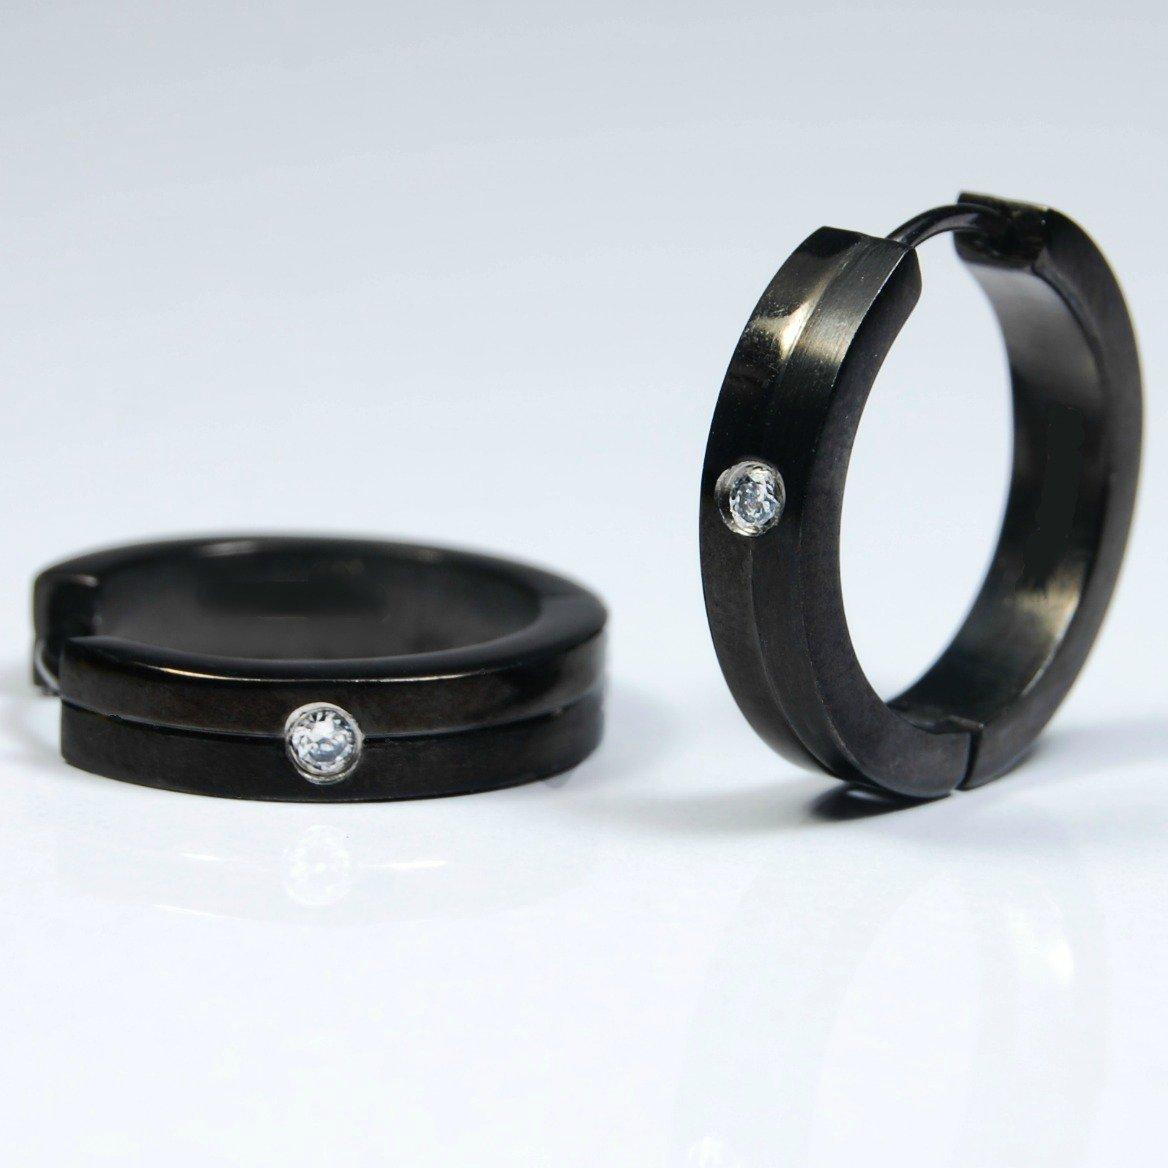 3f76edbb05d1f Extra Large Black Hoop Earrings - Best All Earring Photos ...